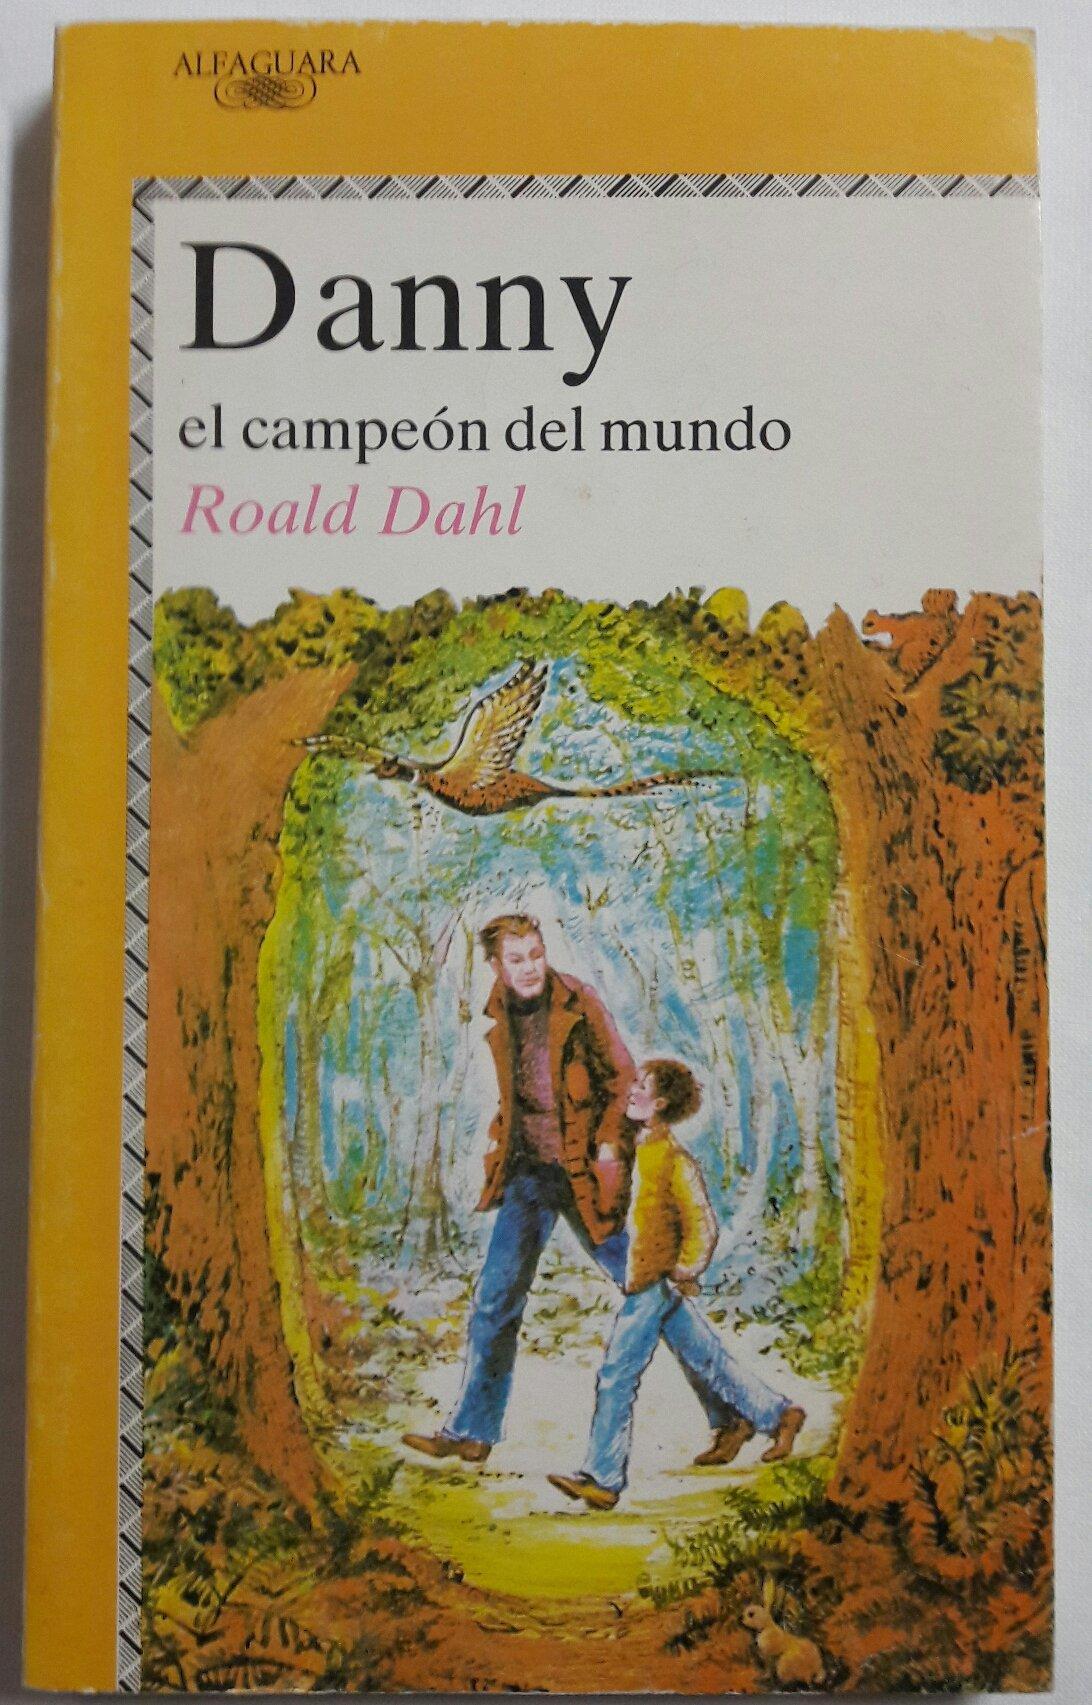 Danny, el campeon del mundo (Alfaguara Juvenil): Amazon.es: Roald, Dahl: Libros